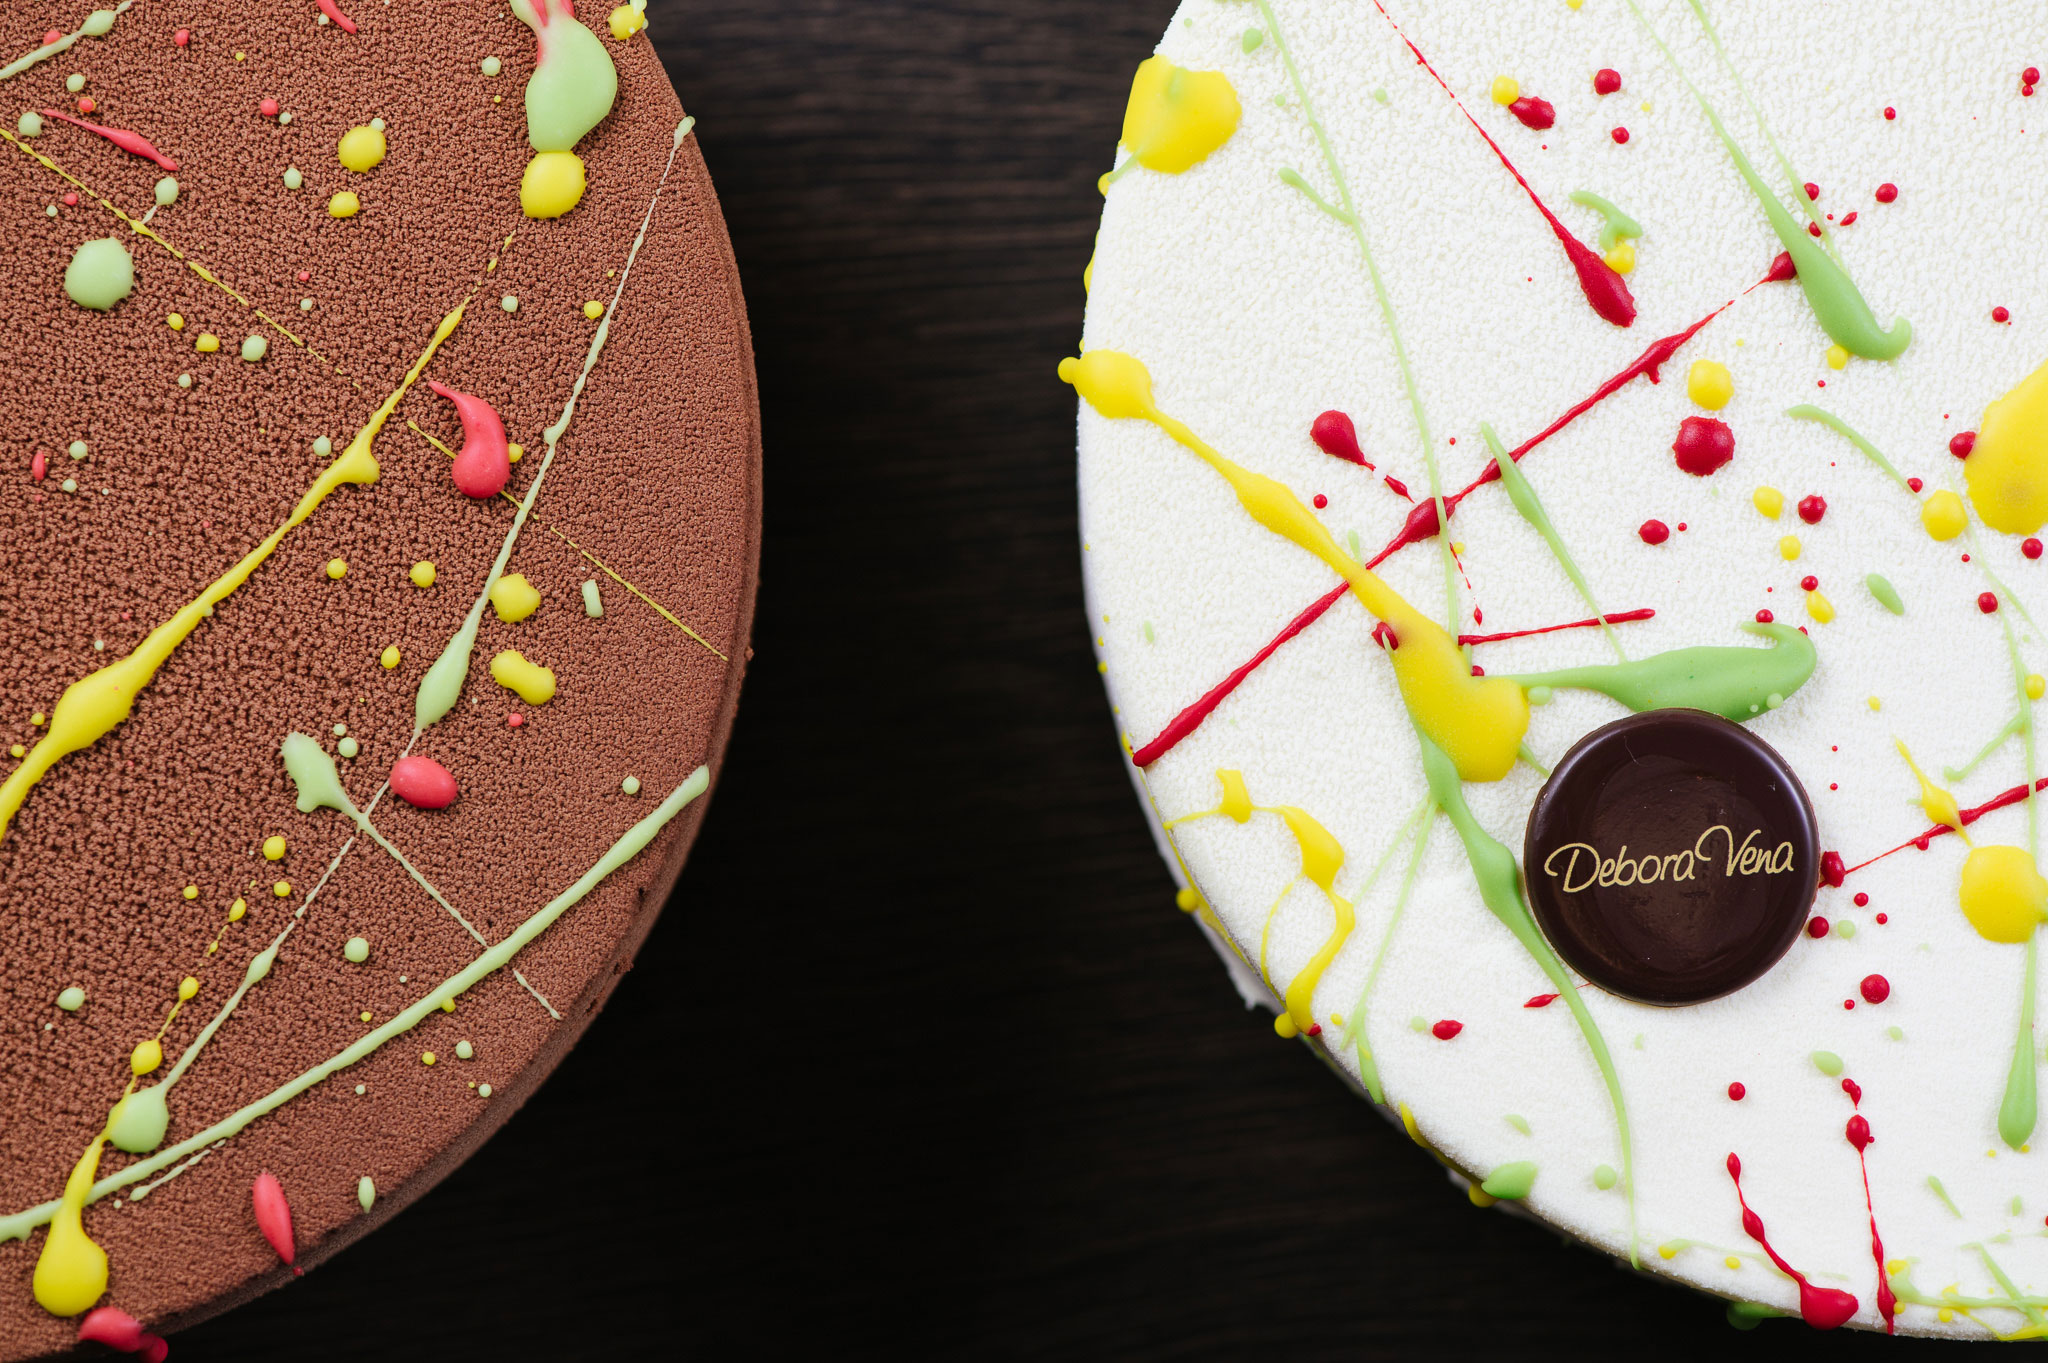 Debora Vena - Torte